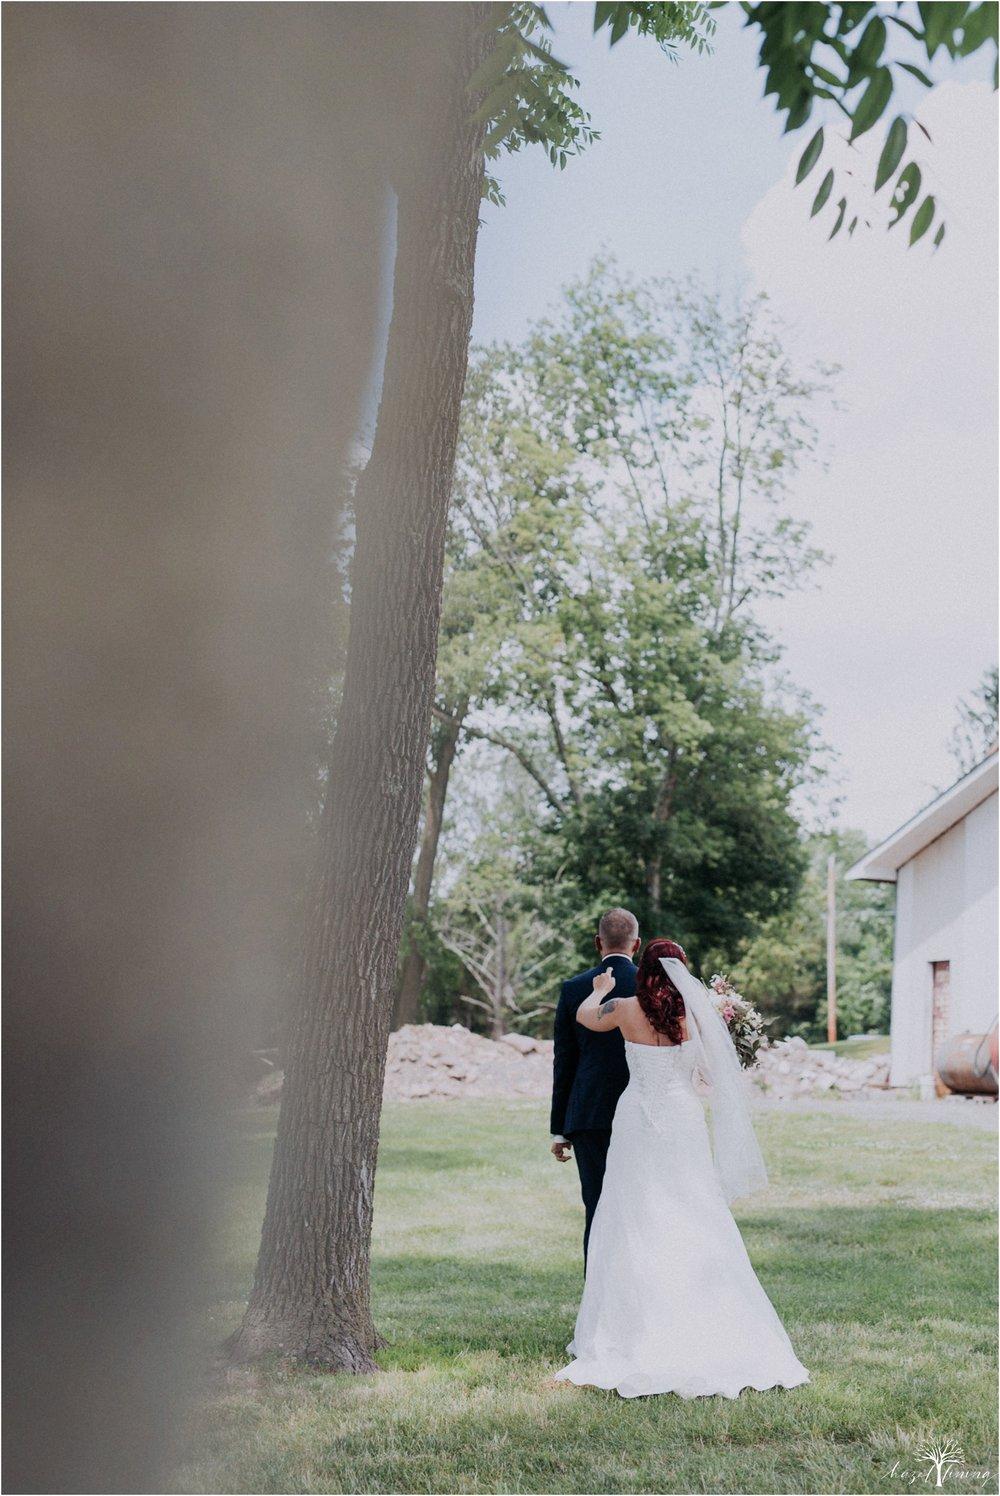 alyssa-james-stiteler-wedding-loft-and-sweet-water-cc-pennsburg-pennsylvania-hazel-lining-travel-wedding-elopement-photography_0026.jpg